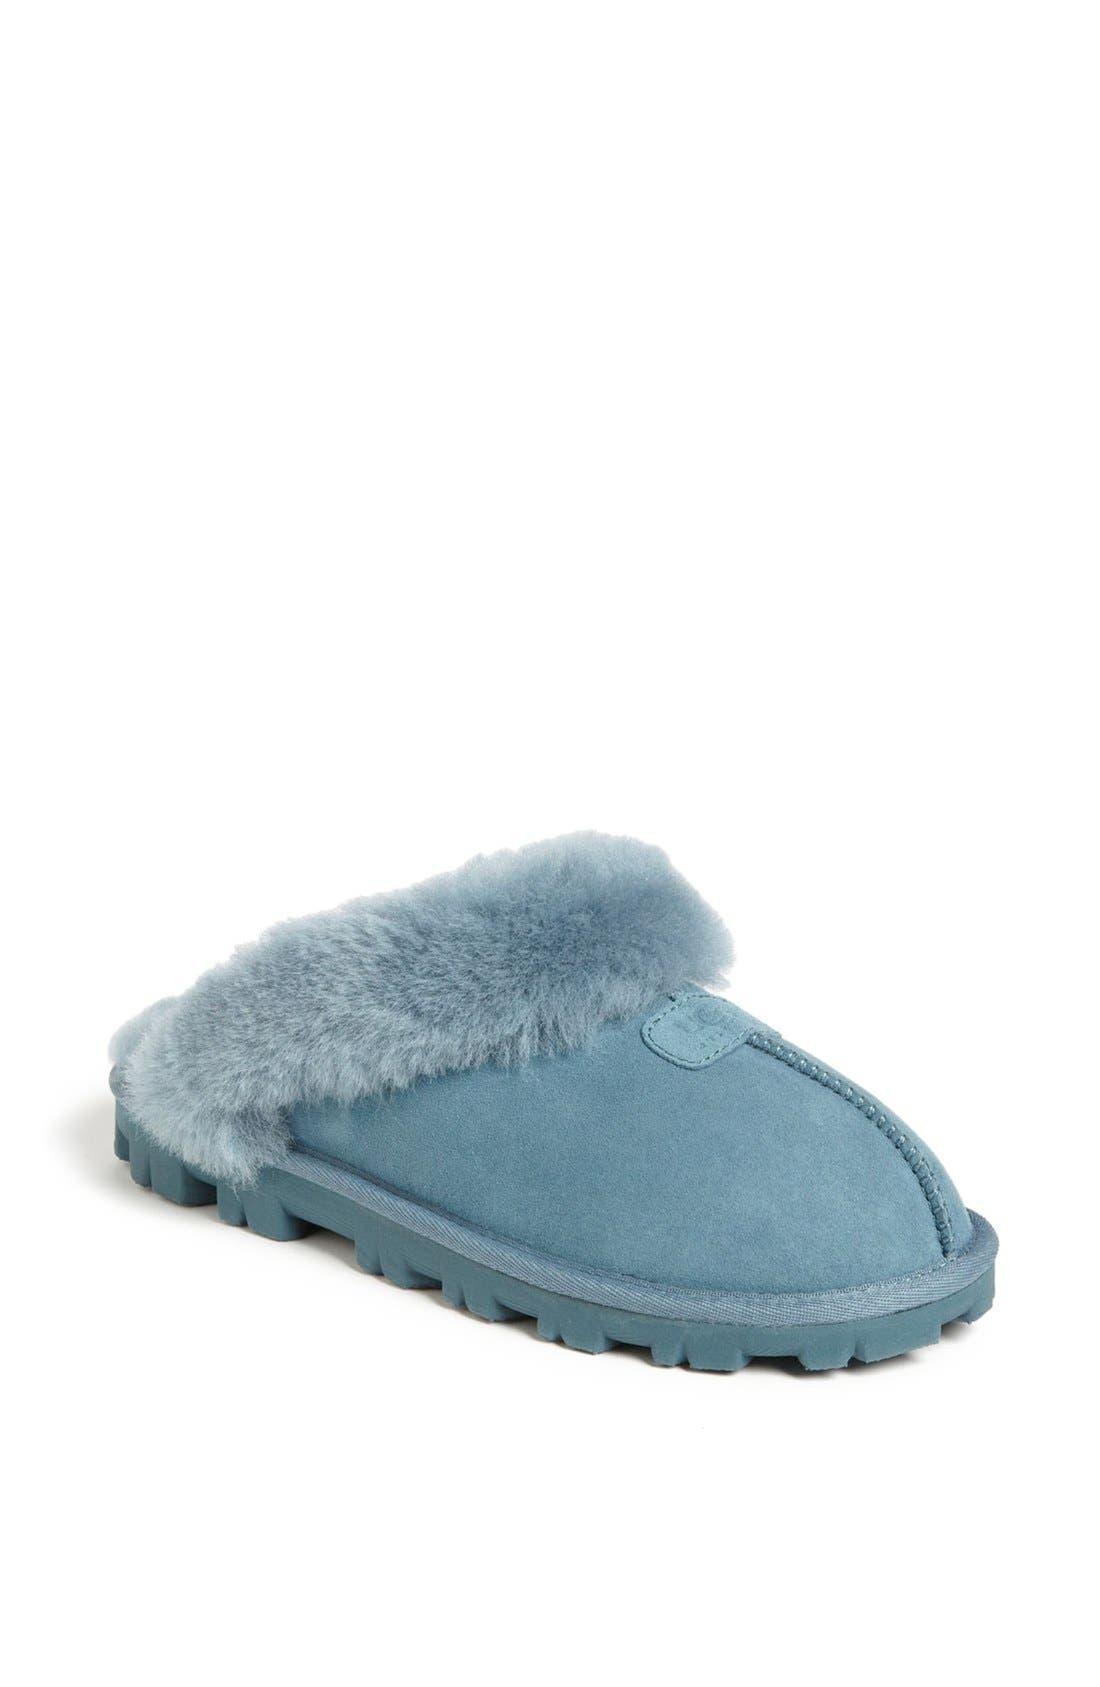 Main Image - UGG® Australia Slipper (Women) (Exclusive Color)